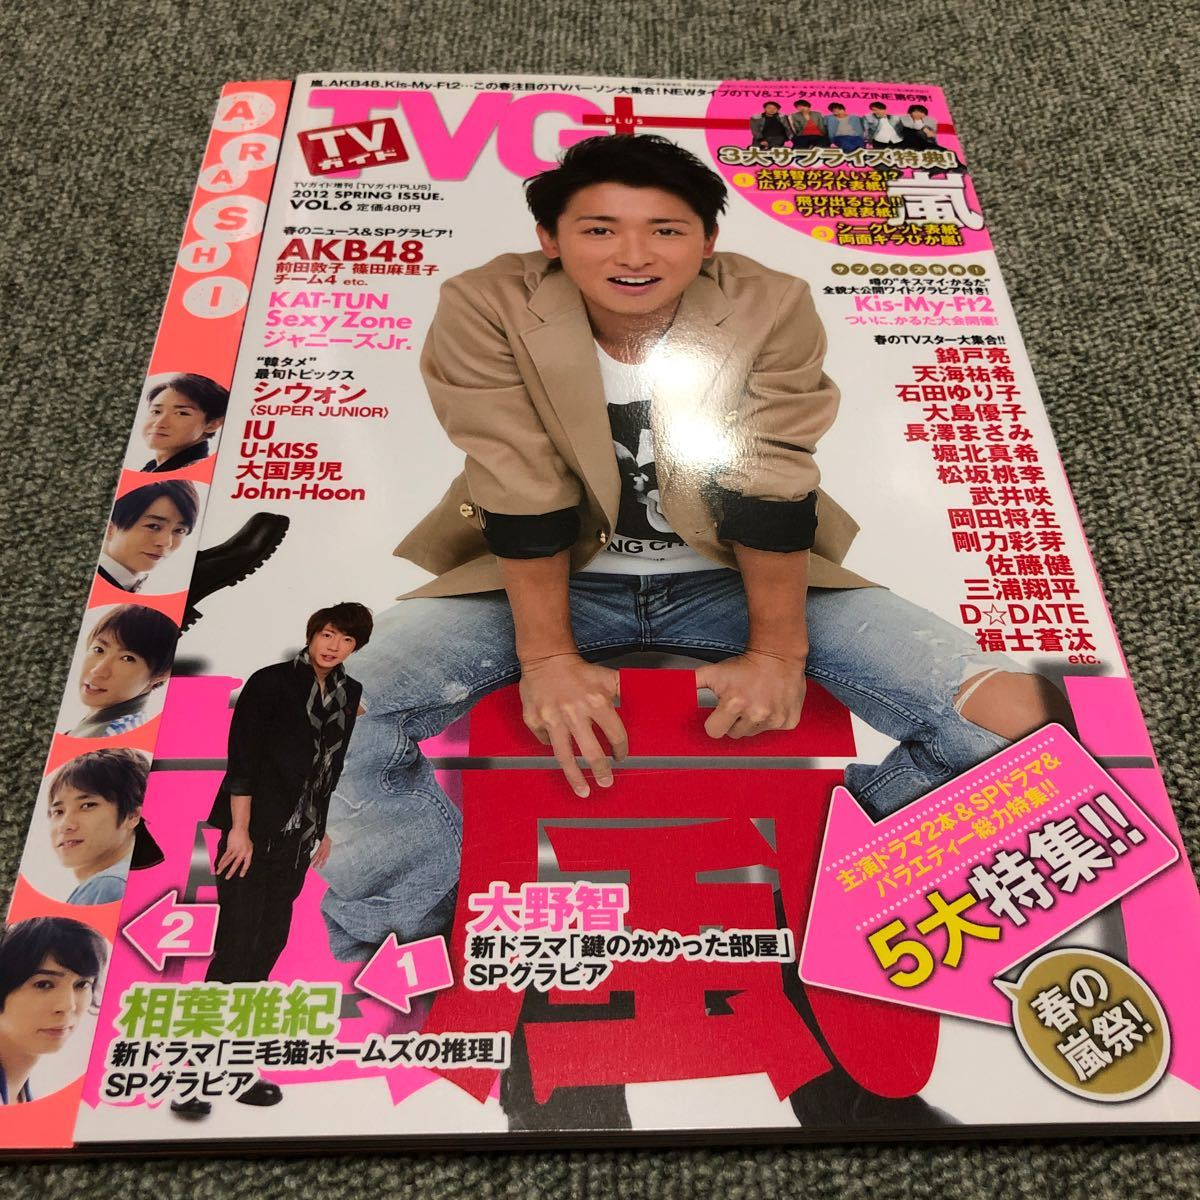 TVガイドPLUS VOL.6/2012 表紙嵐 大野智